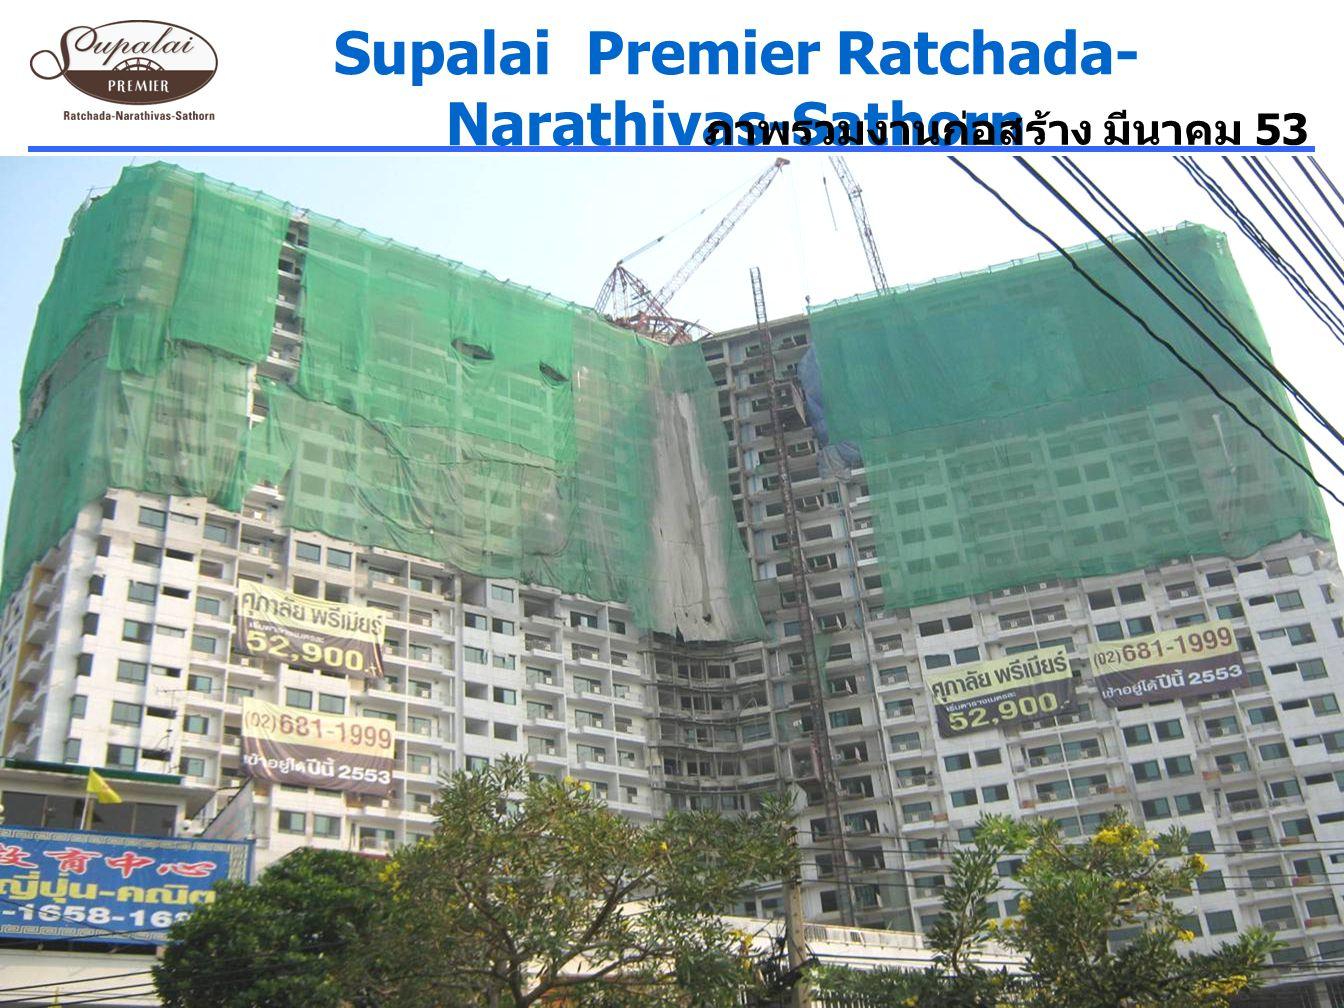 Supalai Premier Ratchada- Narathivas-Sathorn ภาพรวมงานก่อสร้าง มีนาคม 53